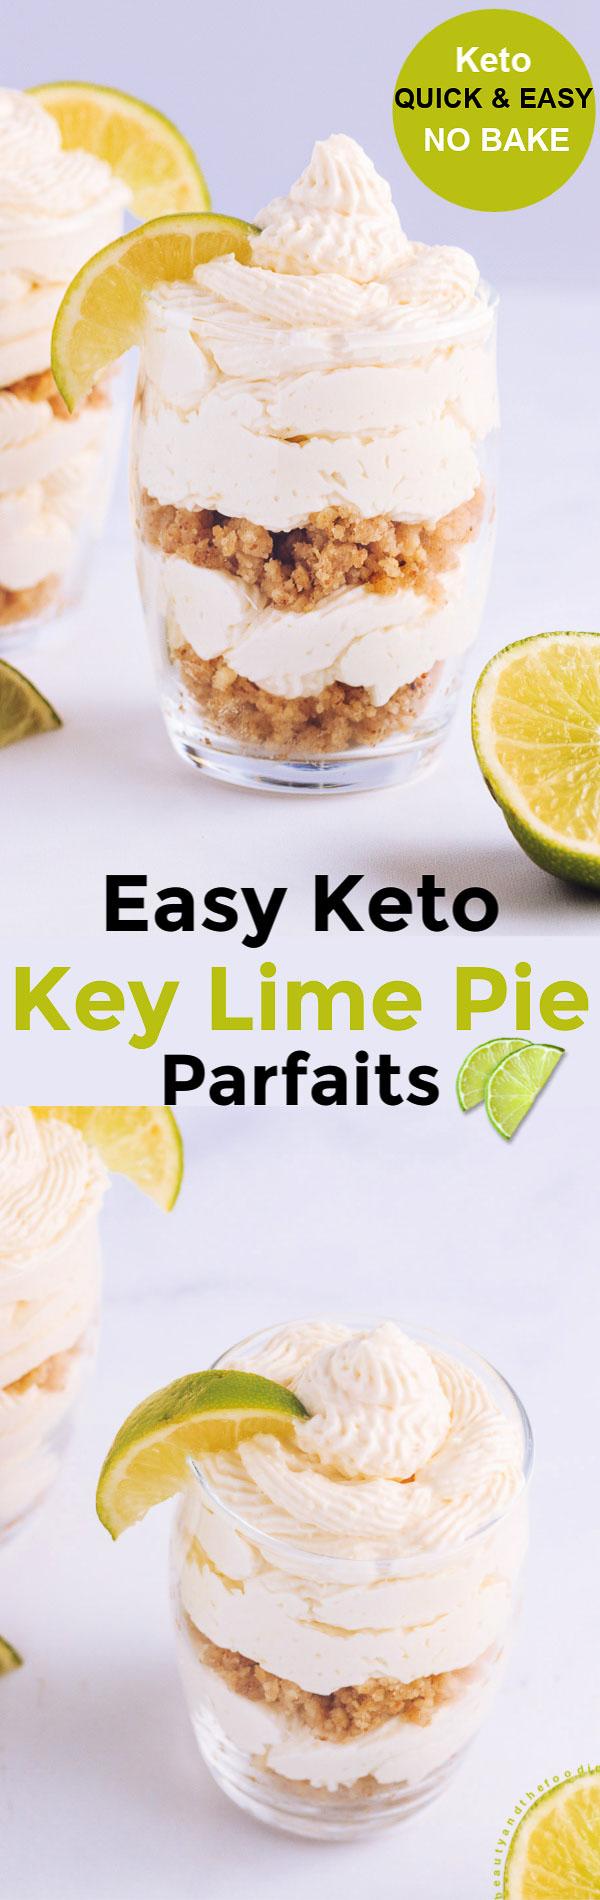 Keto Key Lime Pie Parfaits